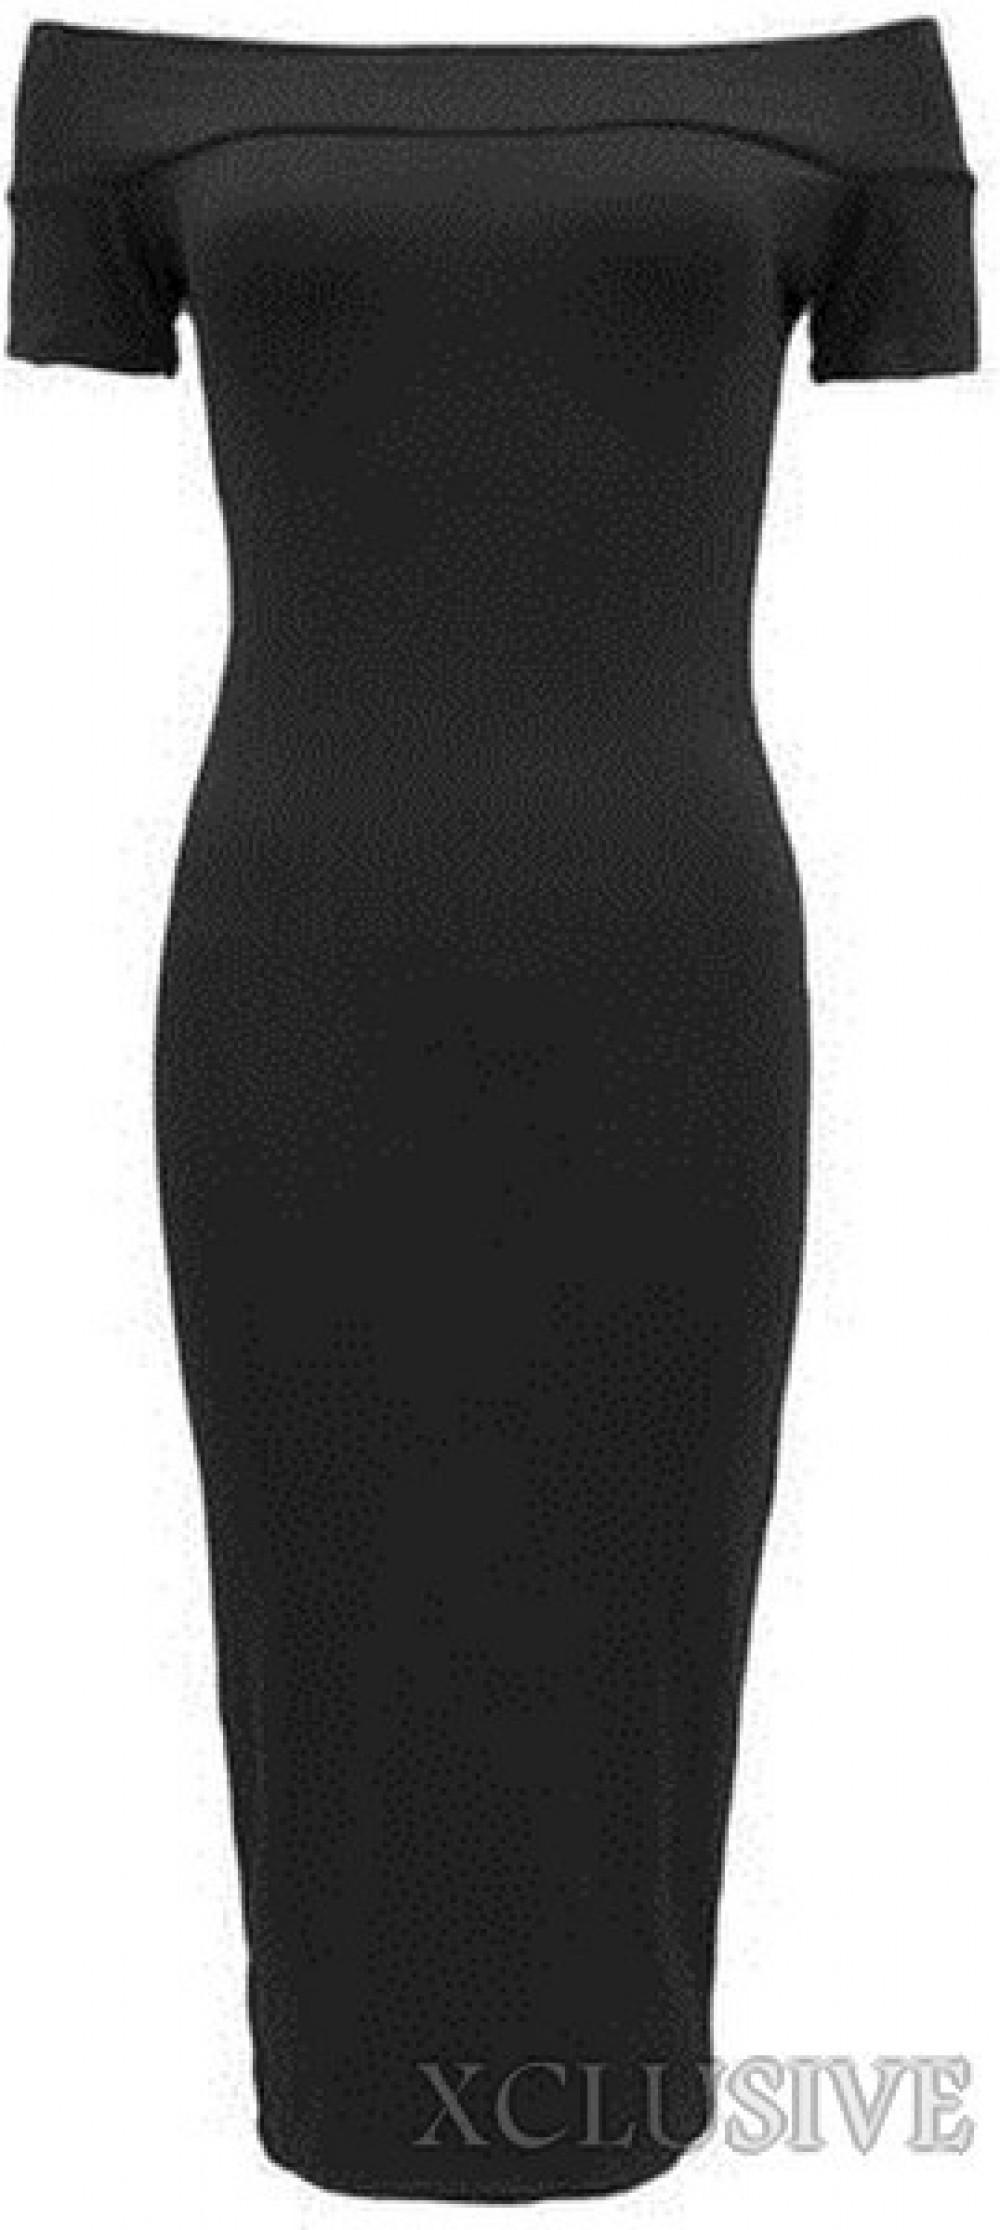 Women'S Plus Size Midi Dresses - Beautiful And Elegant